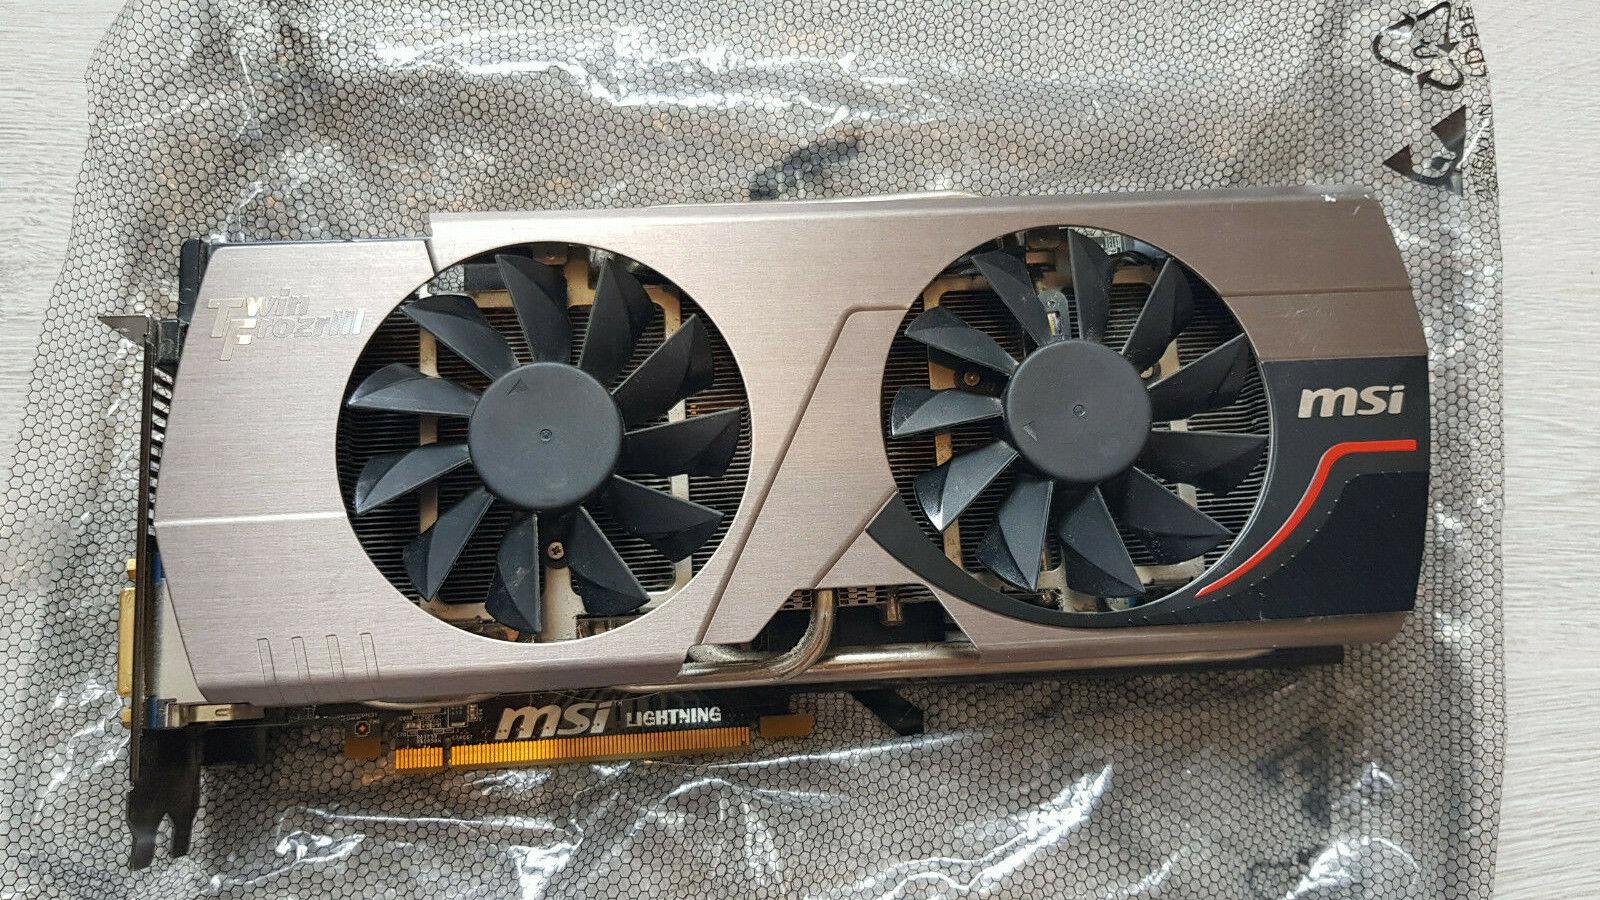 MSI NVIDIA GeForce GTX 580 Lightning (1536 MB) (V256